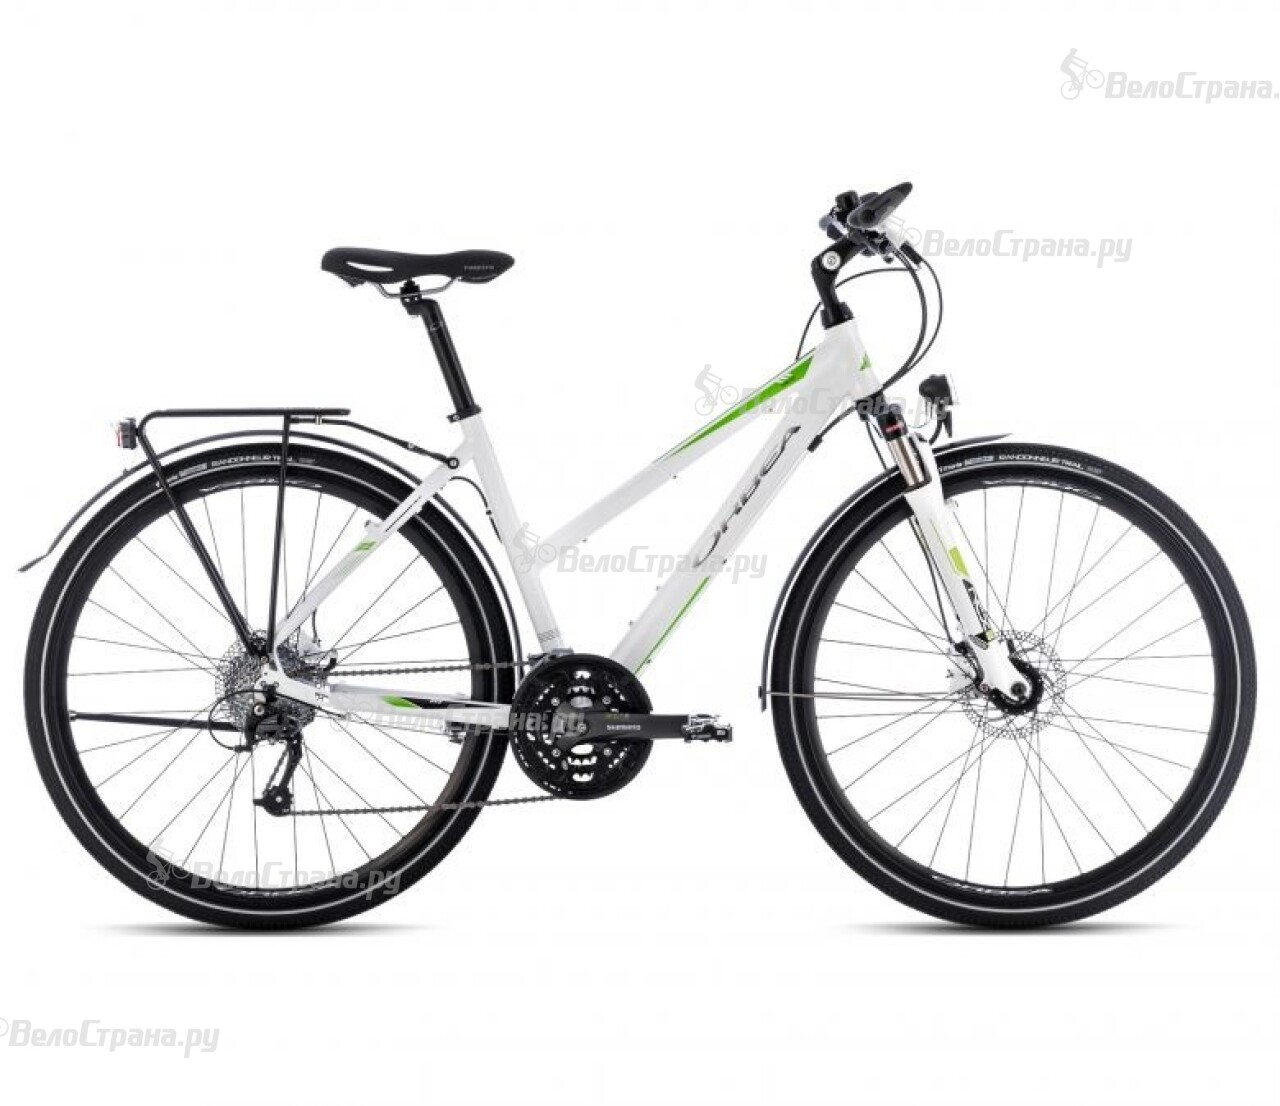 Велосипед Orbea Travel H20 Dama (2014) велосипед orbea travel h30 2014